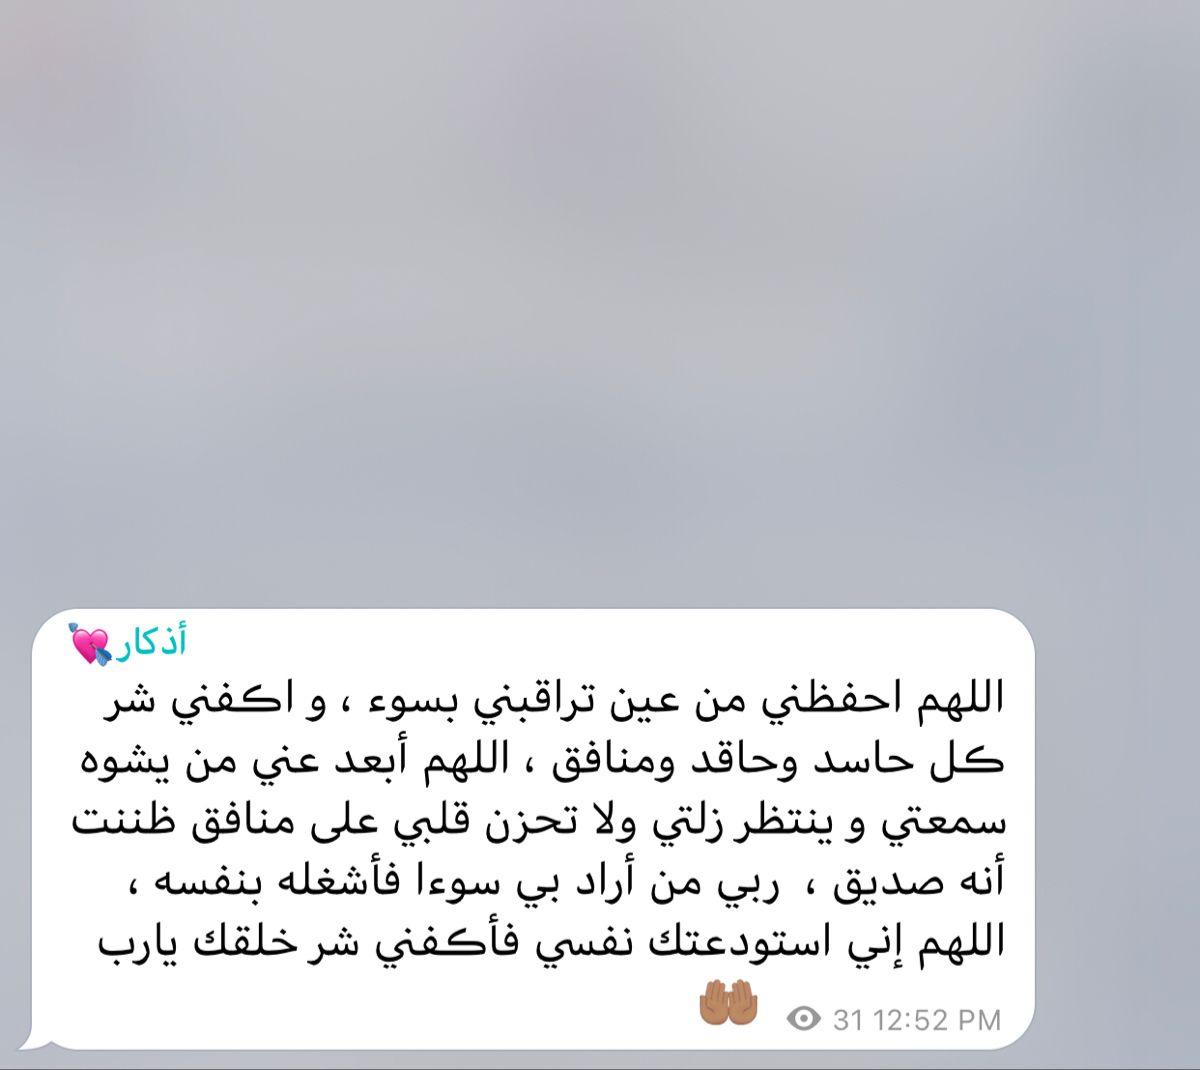 Telegram Contact Adhkar4127